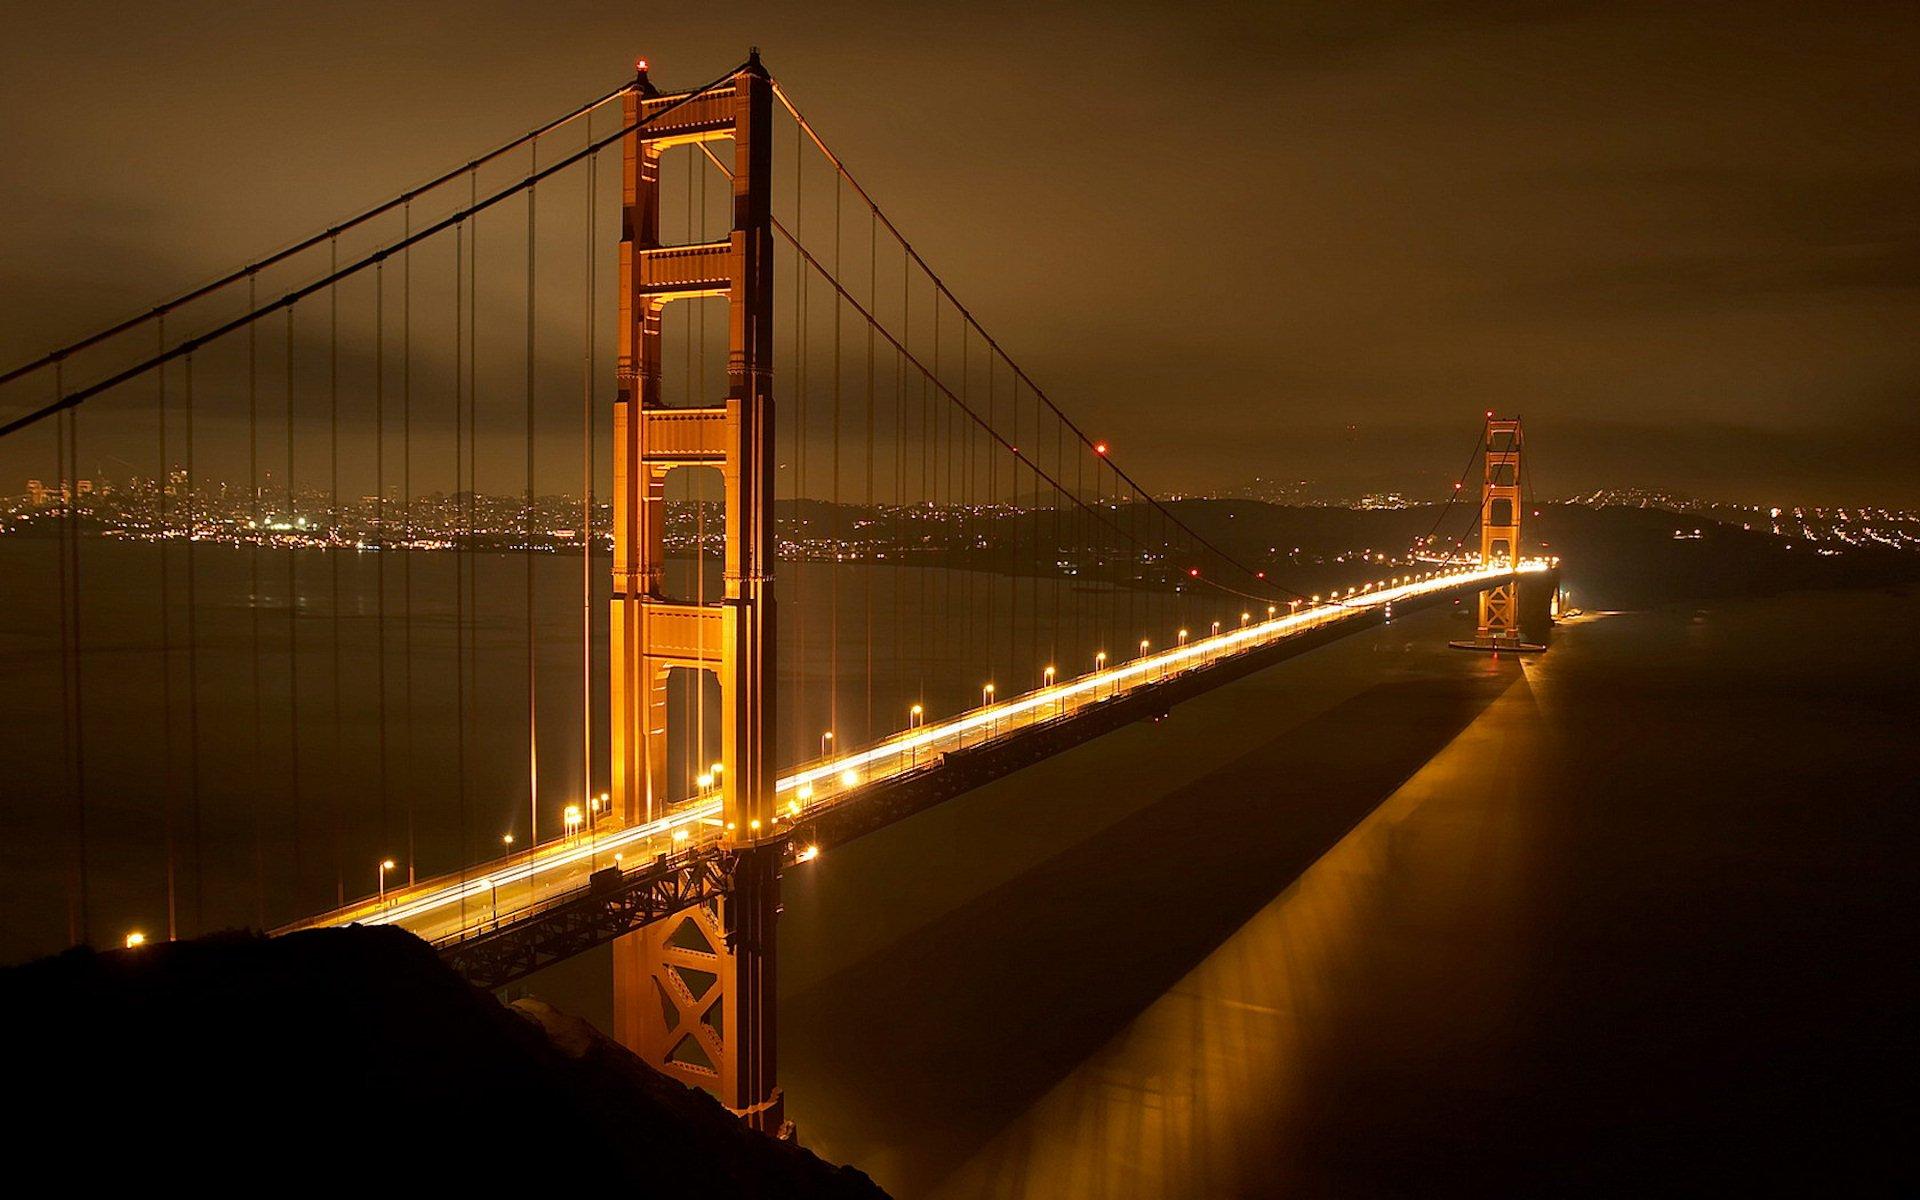 Cool Wallpaper Night Golden Gate Bridge - Golden%20Gate%20Bridge%20Nights4841111747  You Should Have-148480.jpg